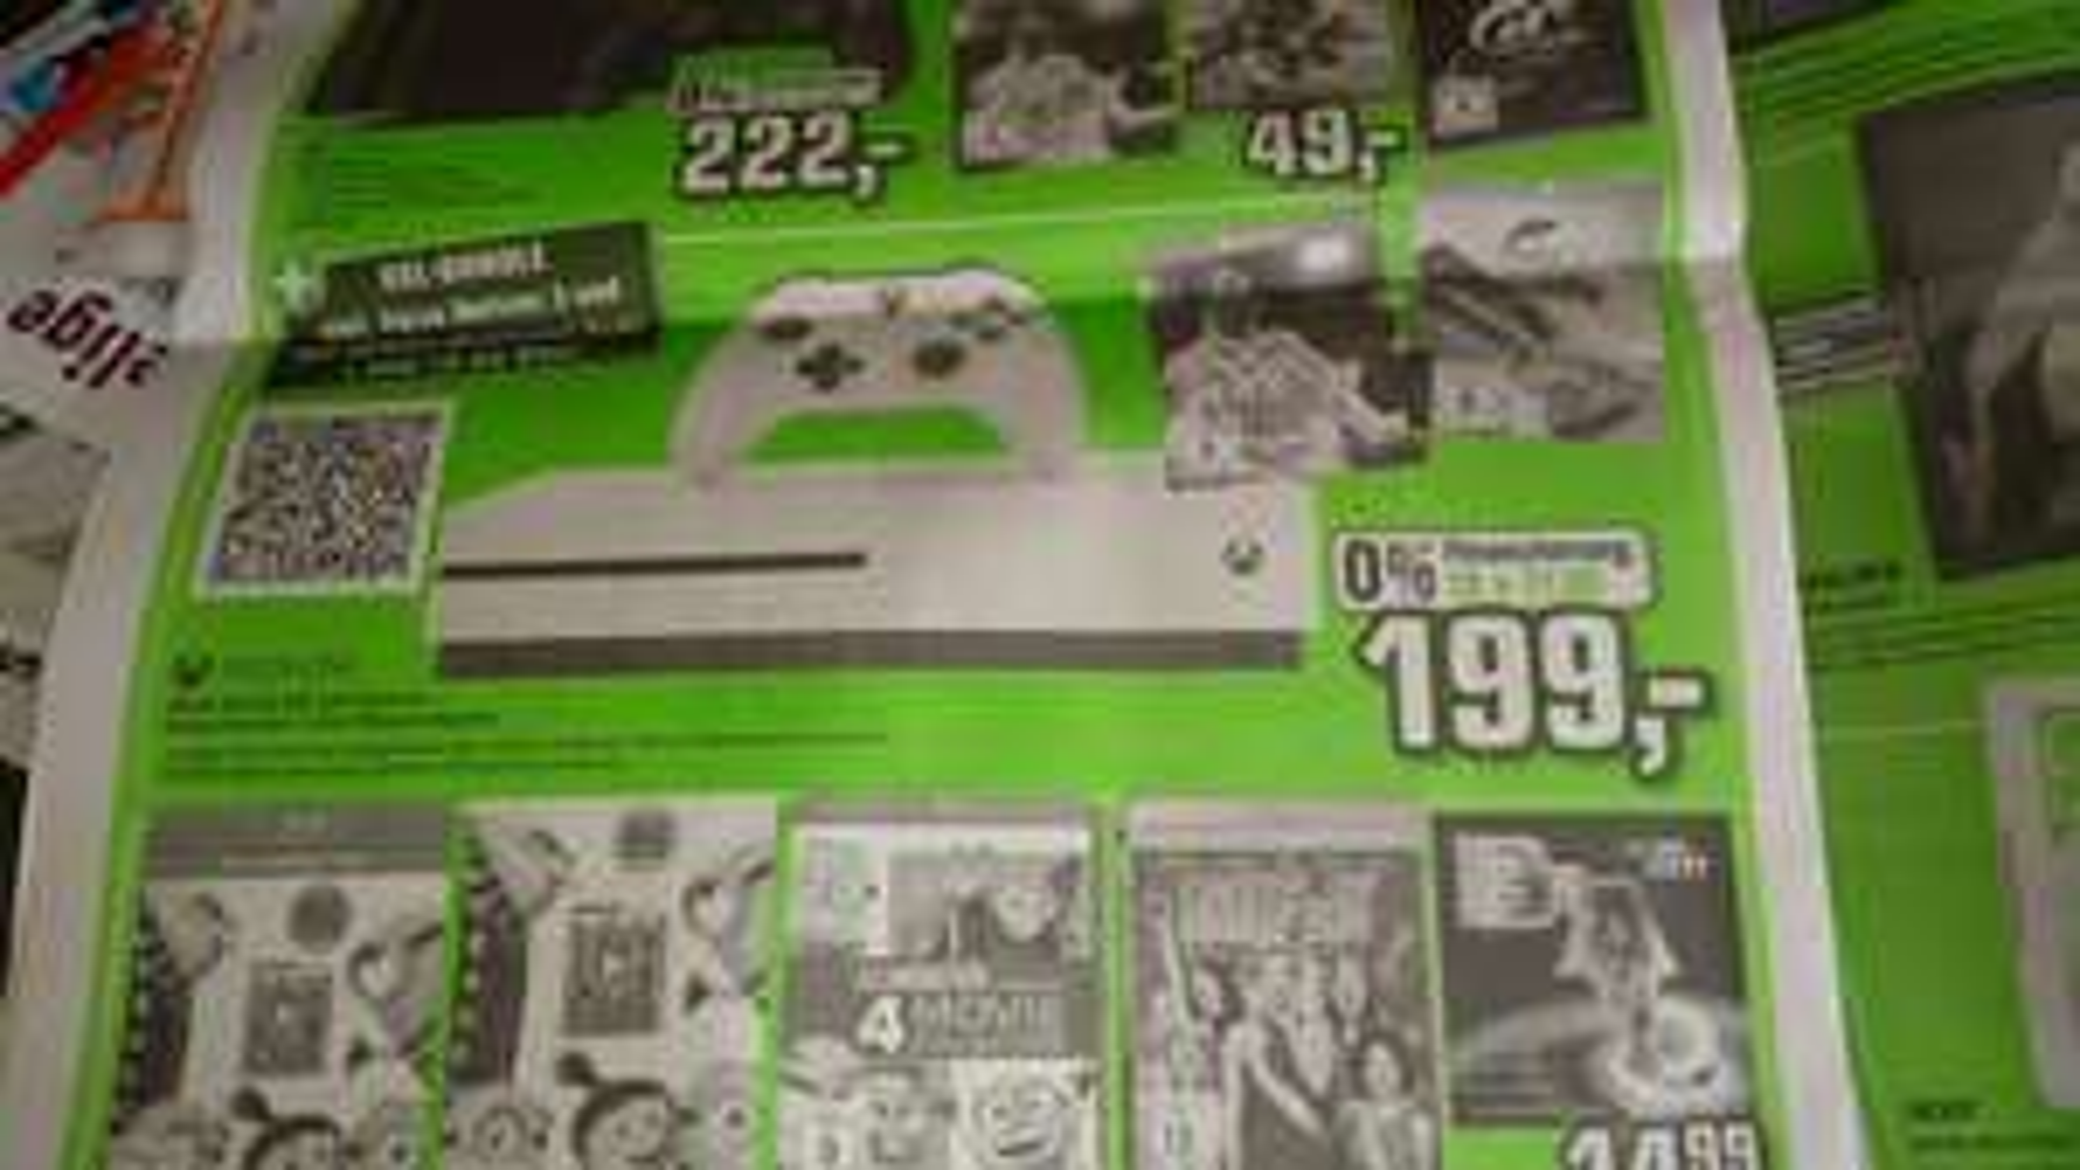 Xbox One S 500gb Forza Horizon 3 Bundle (Hotwheels) mit FIFA 18